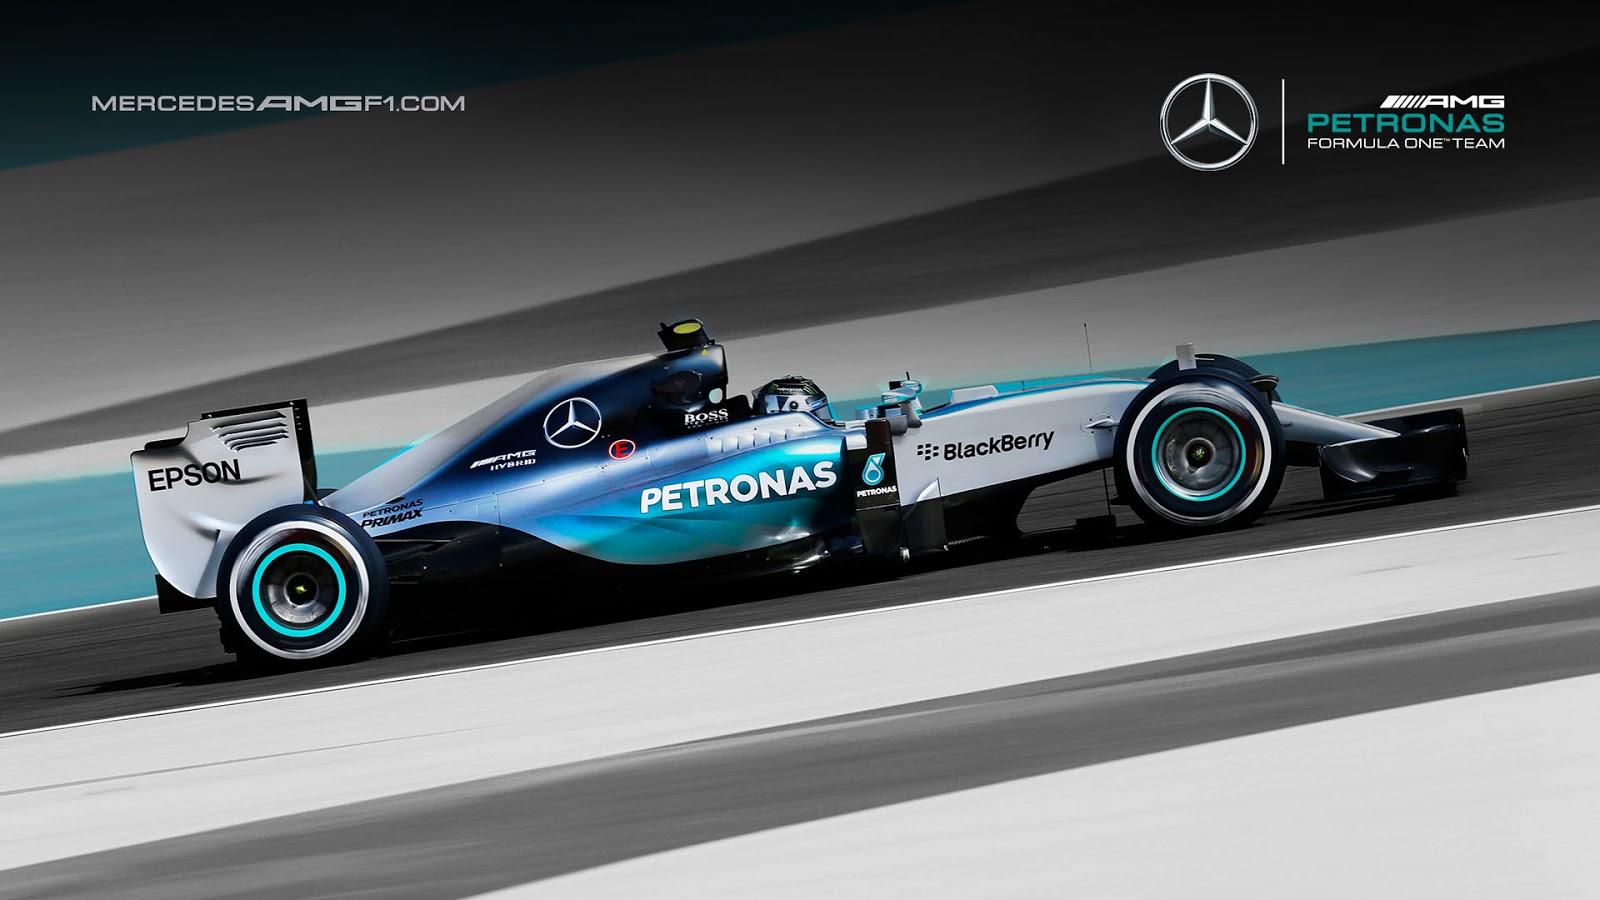 Mercedes amg petronas w08 wallpaper 5